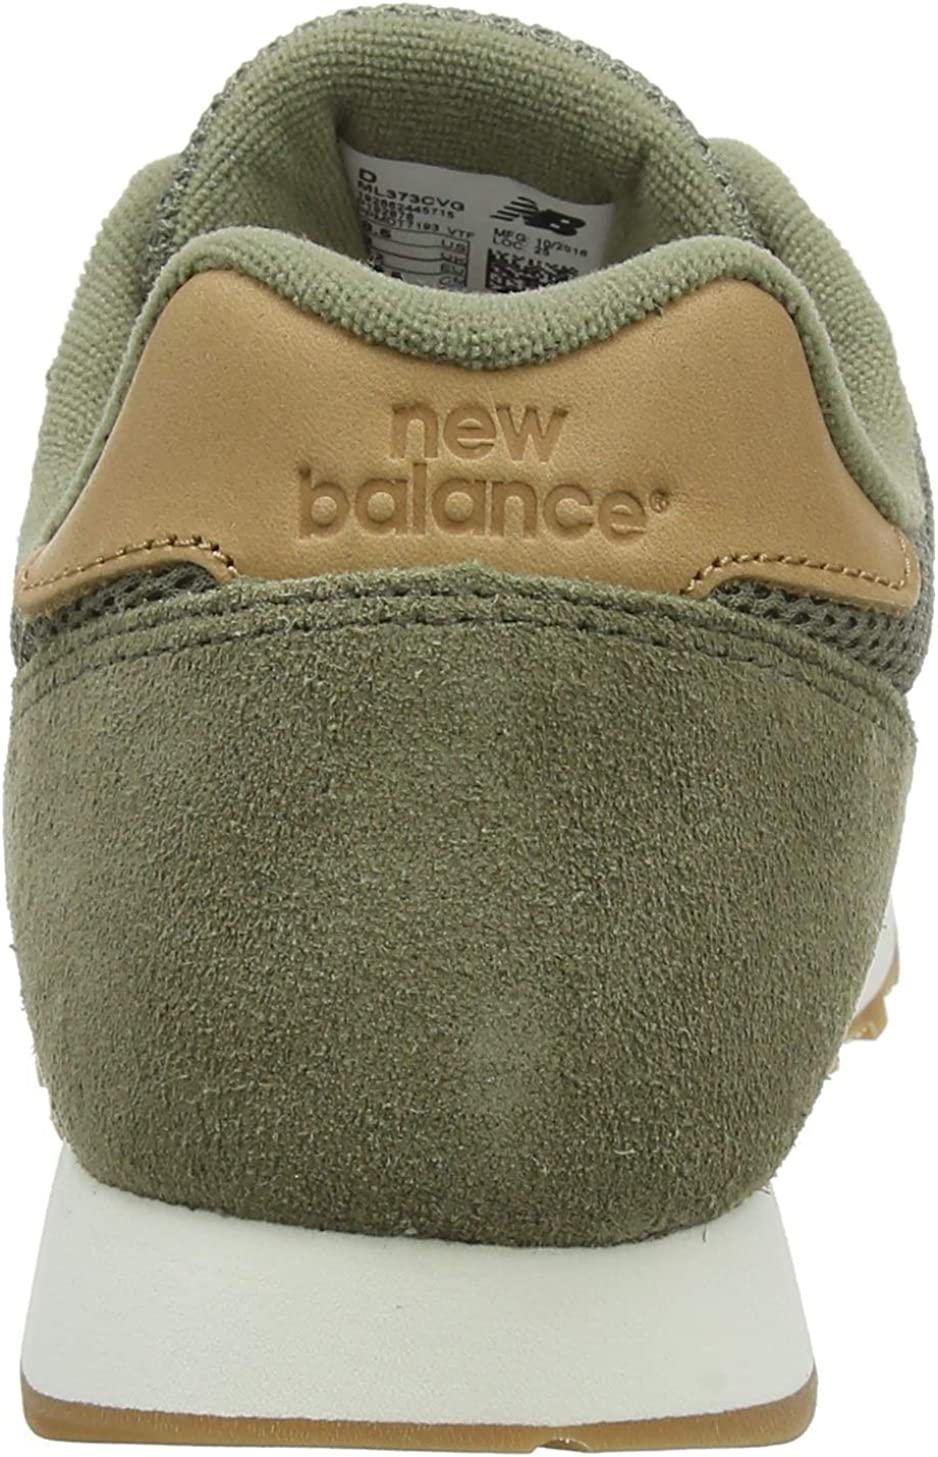 New Balance 373 Khaki Suede Trainers